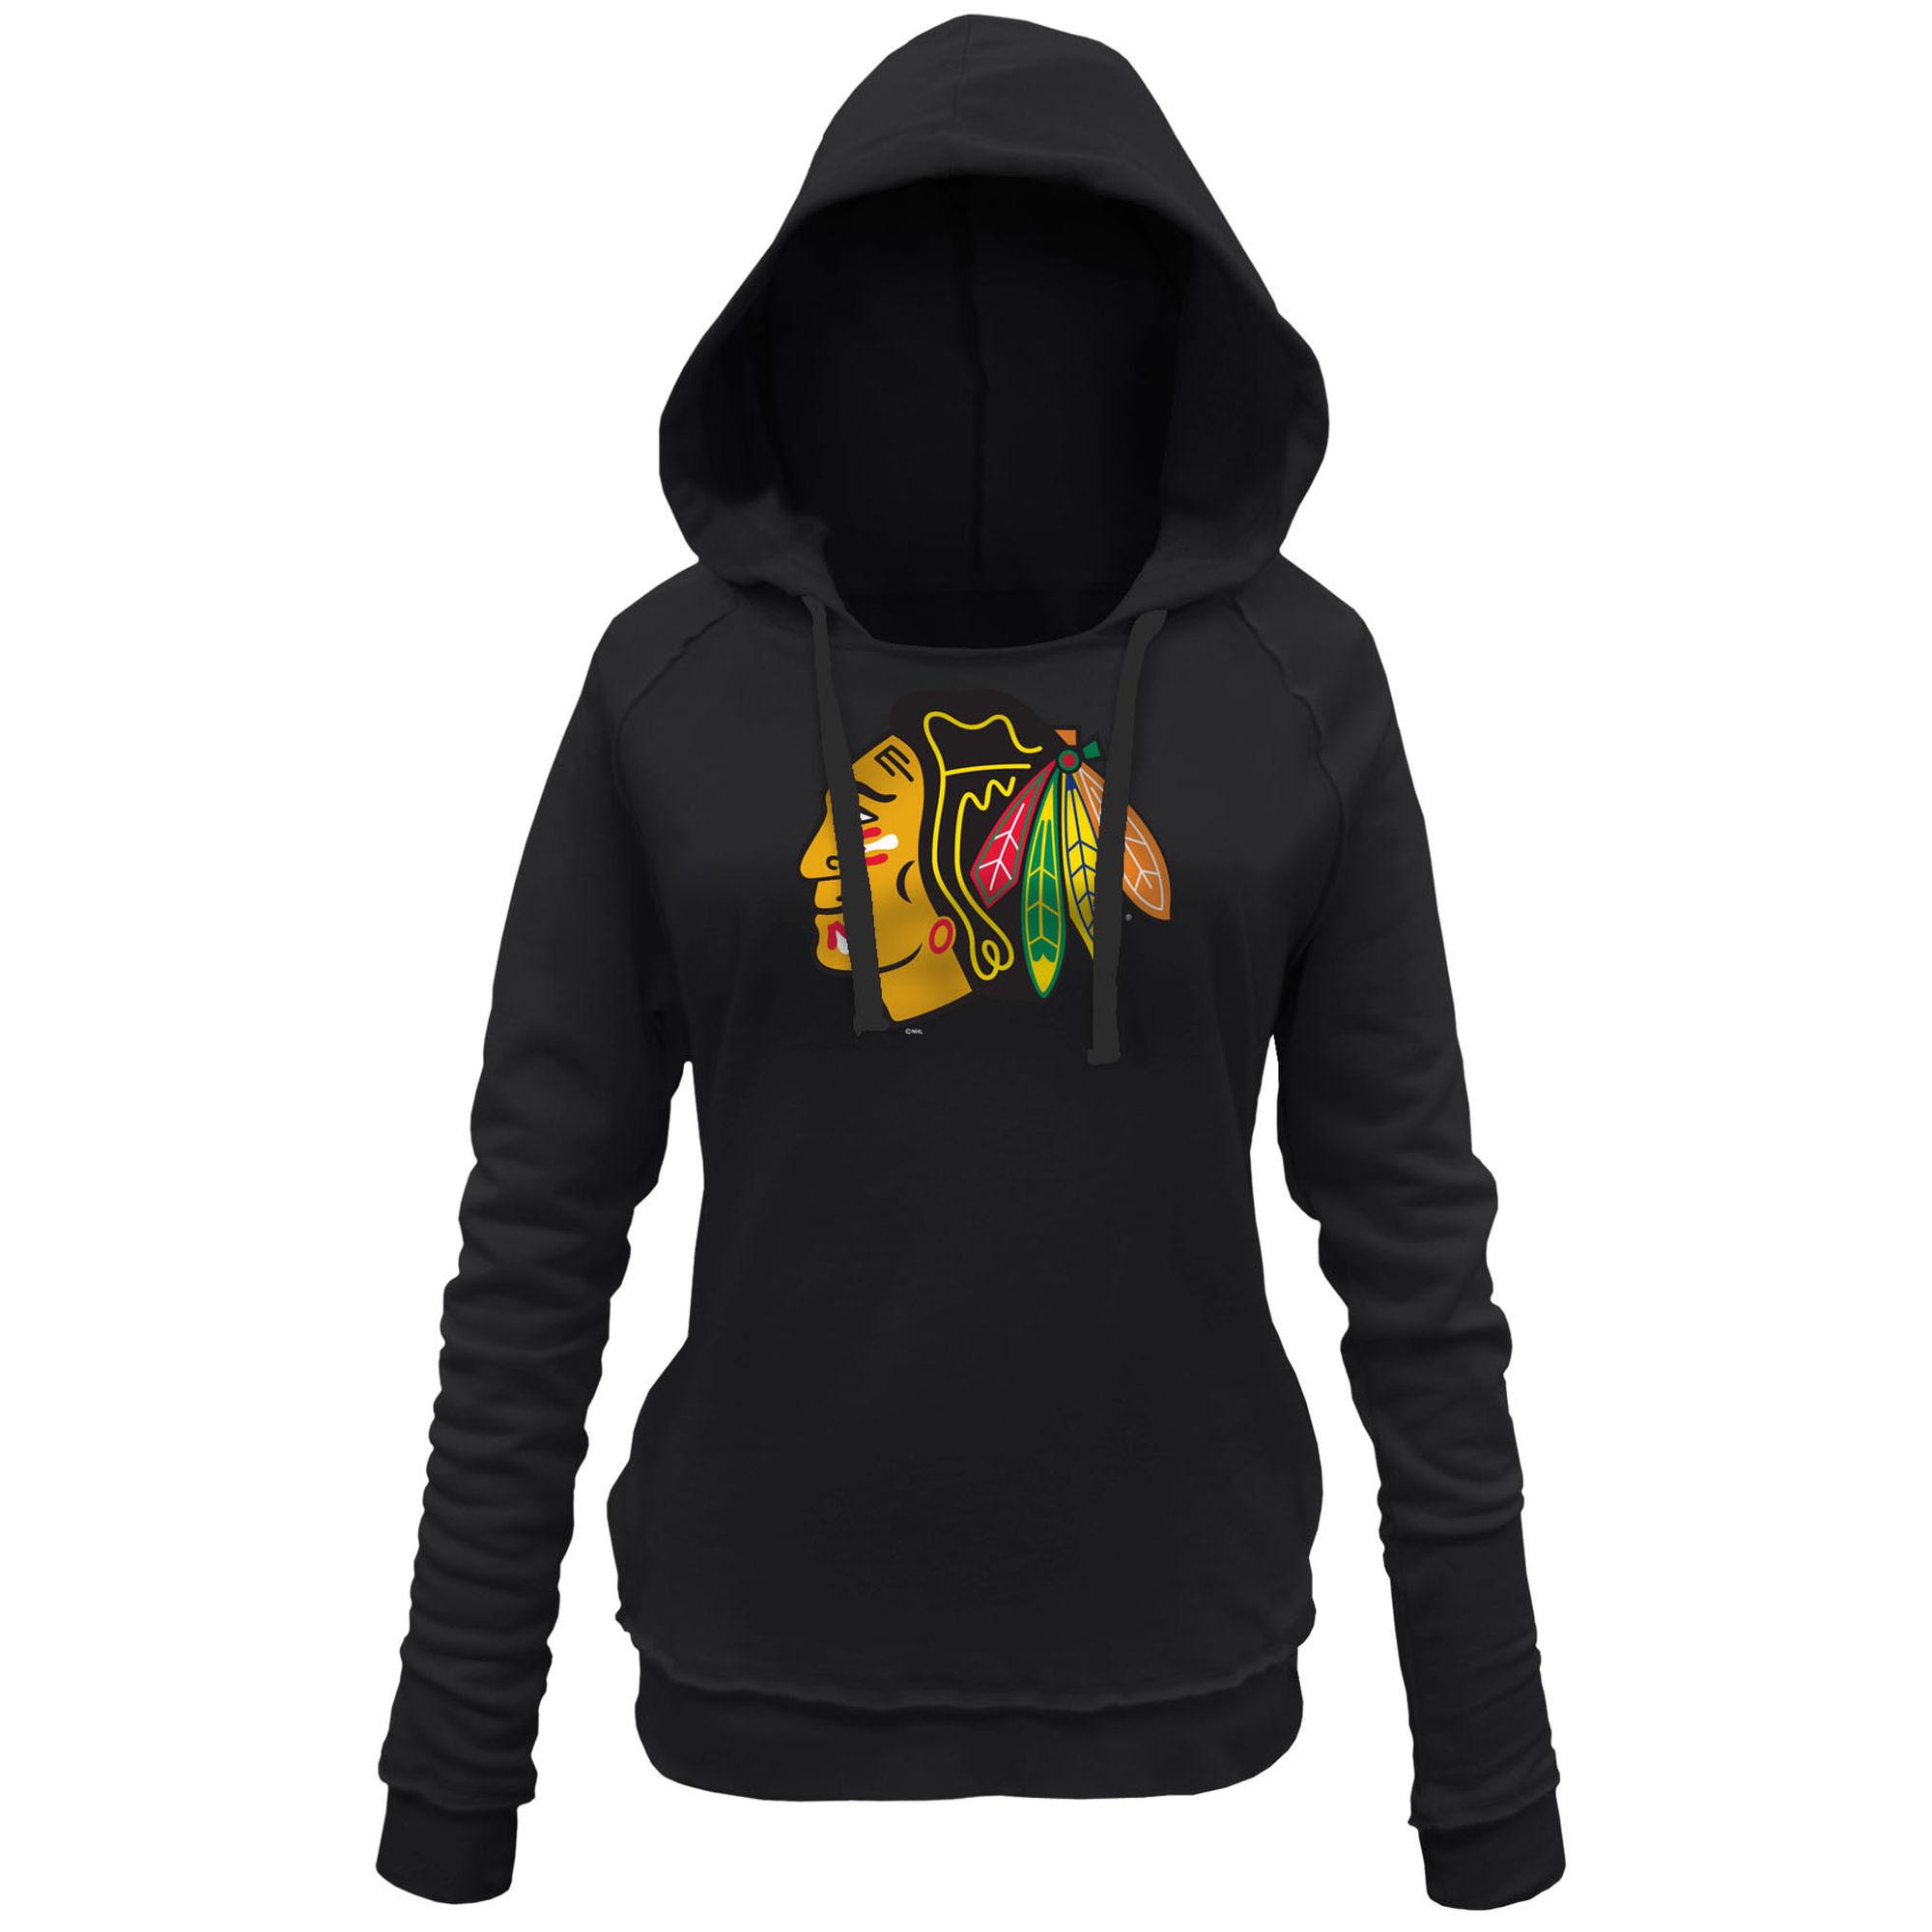 Blackhawks Black Women's Customized All Stitched Hooded Sweatshirt